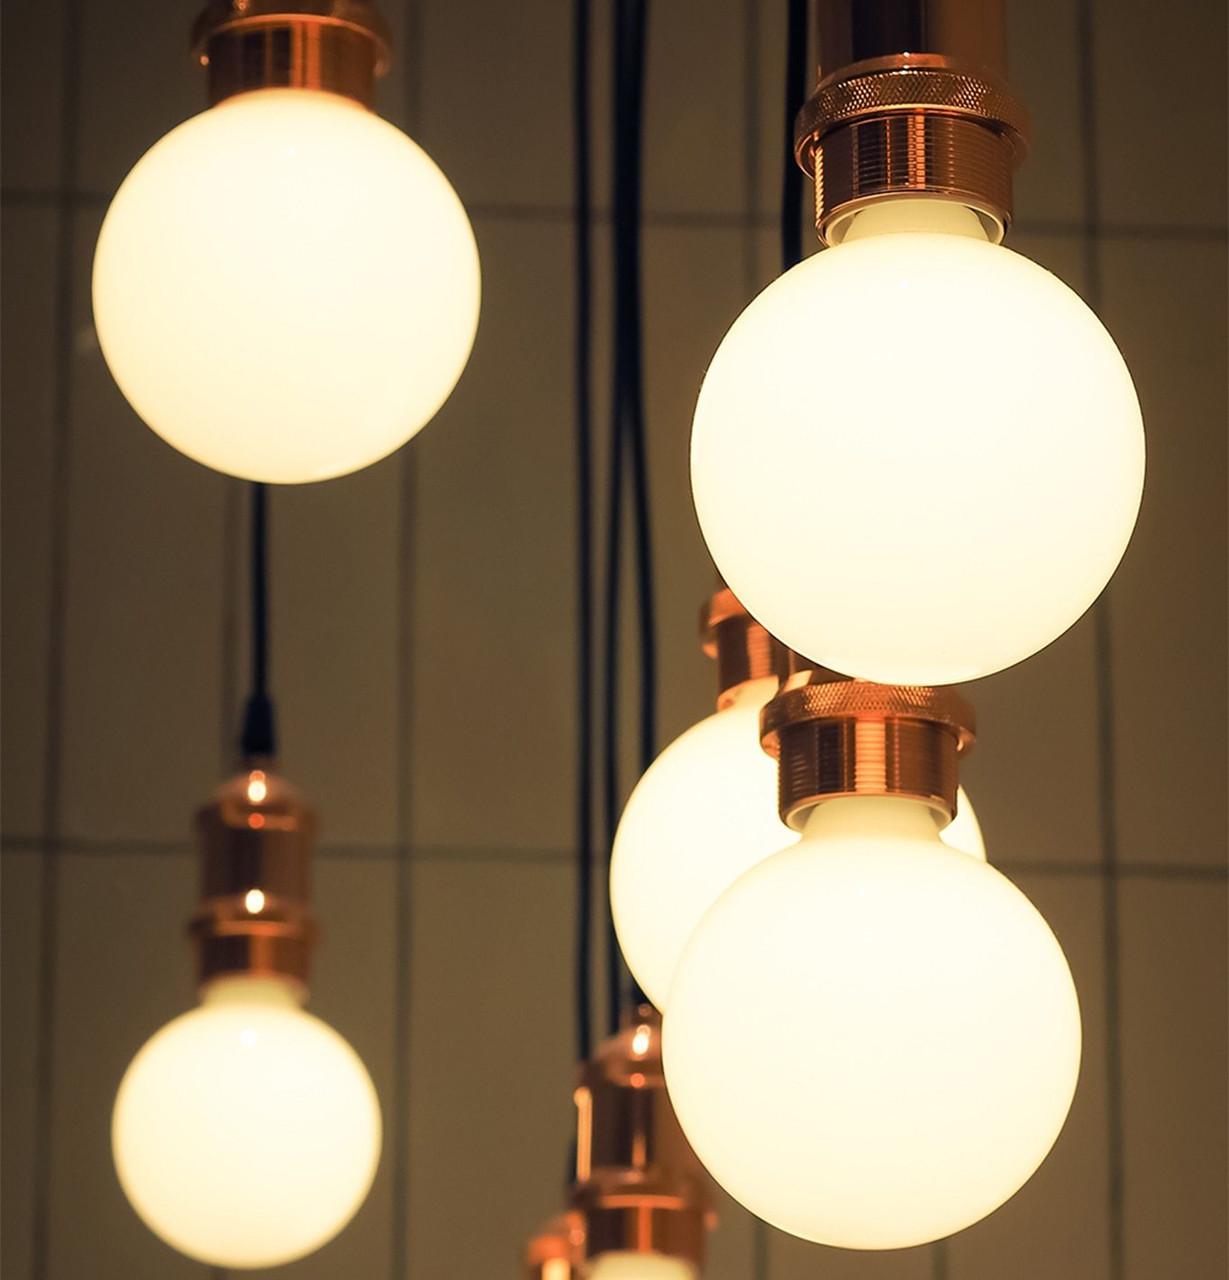 Crompton Lamps LED G95 2200K Light Bulbs